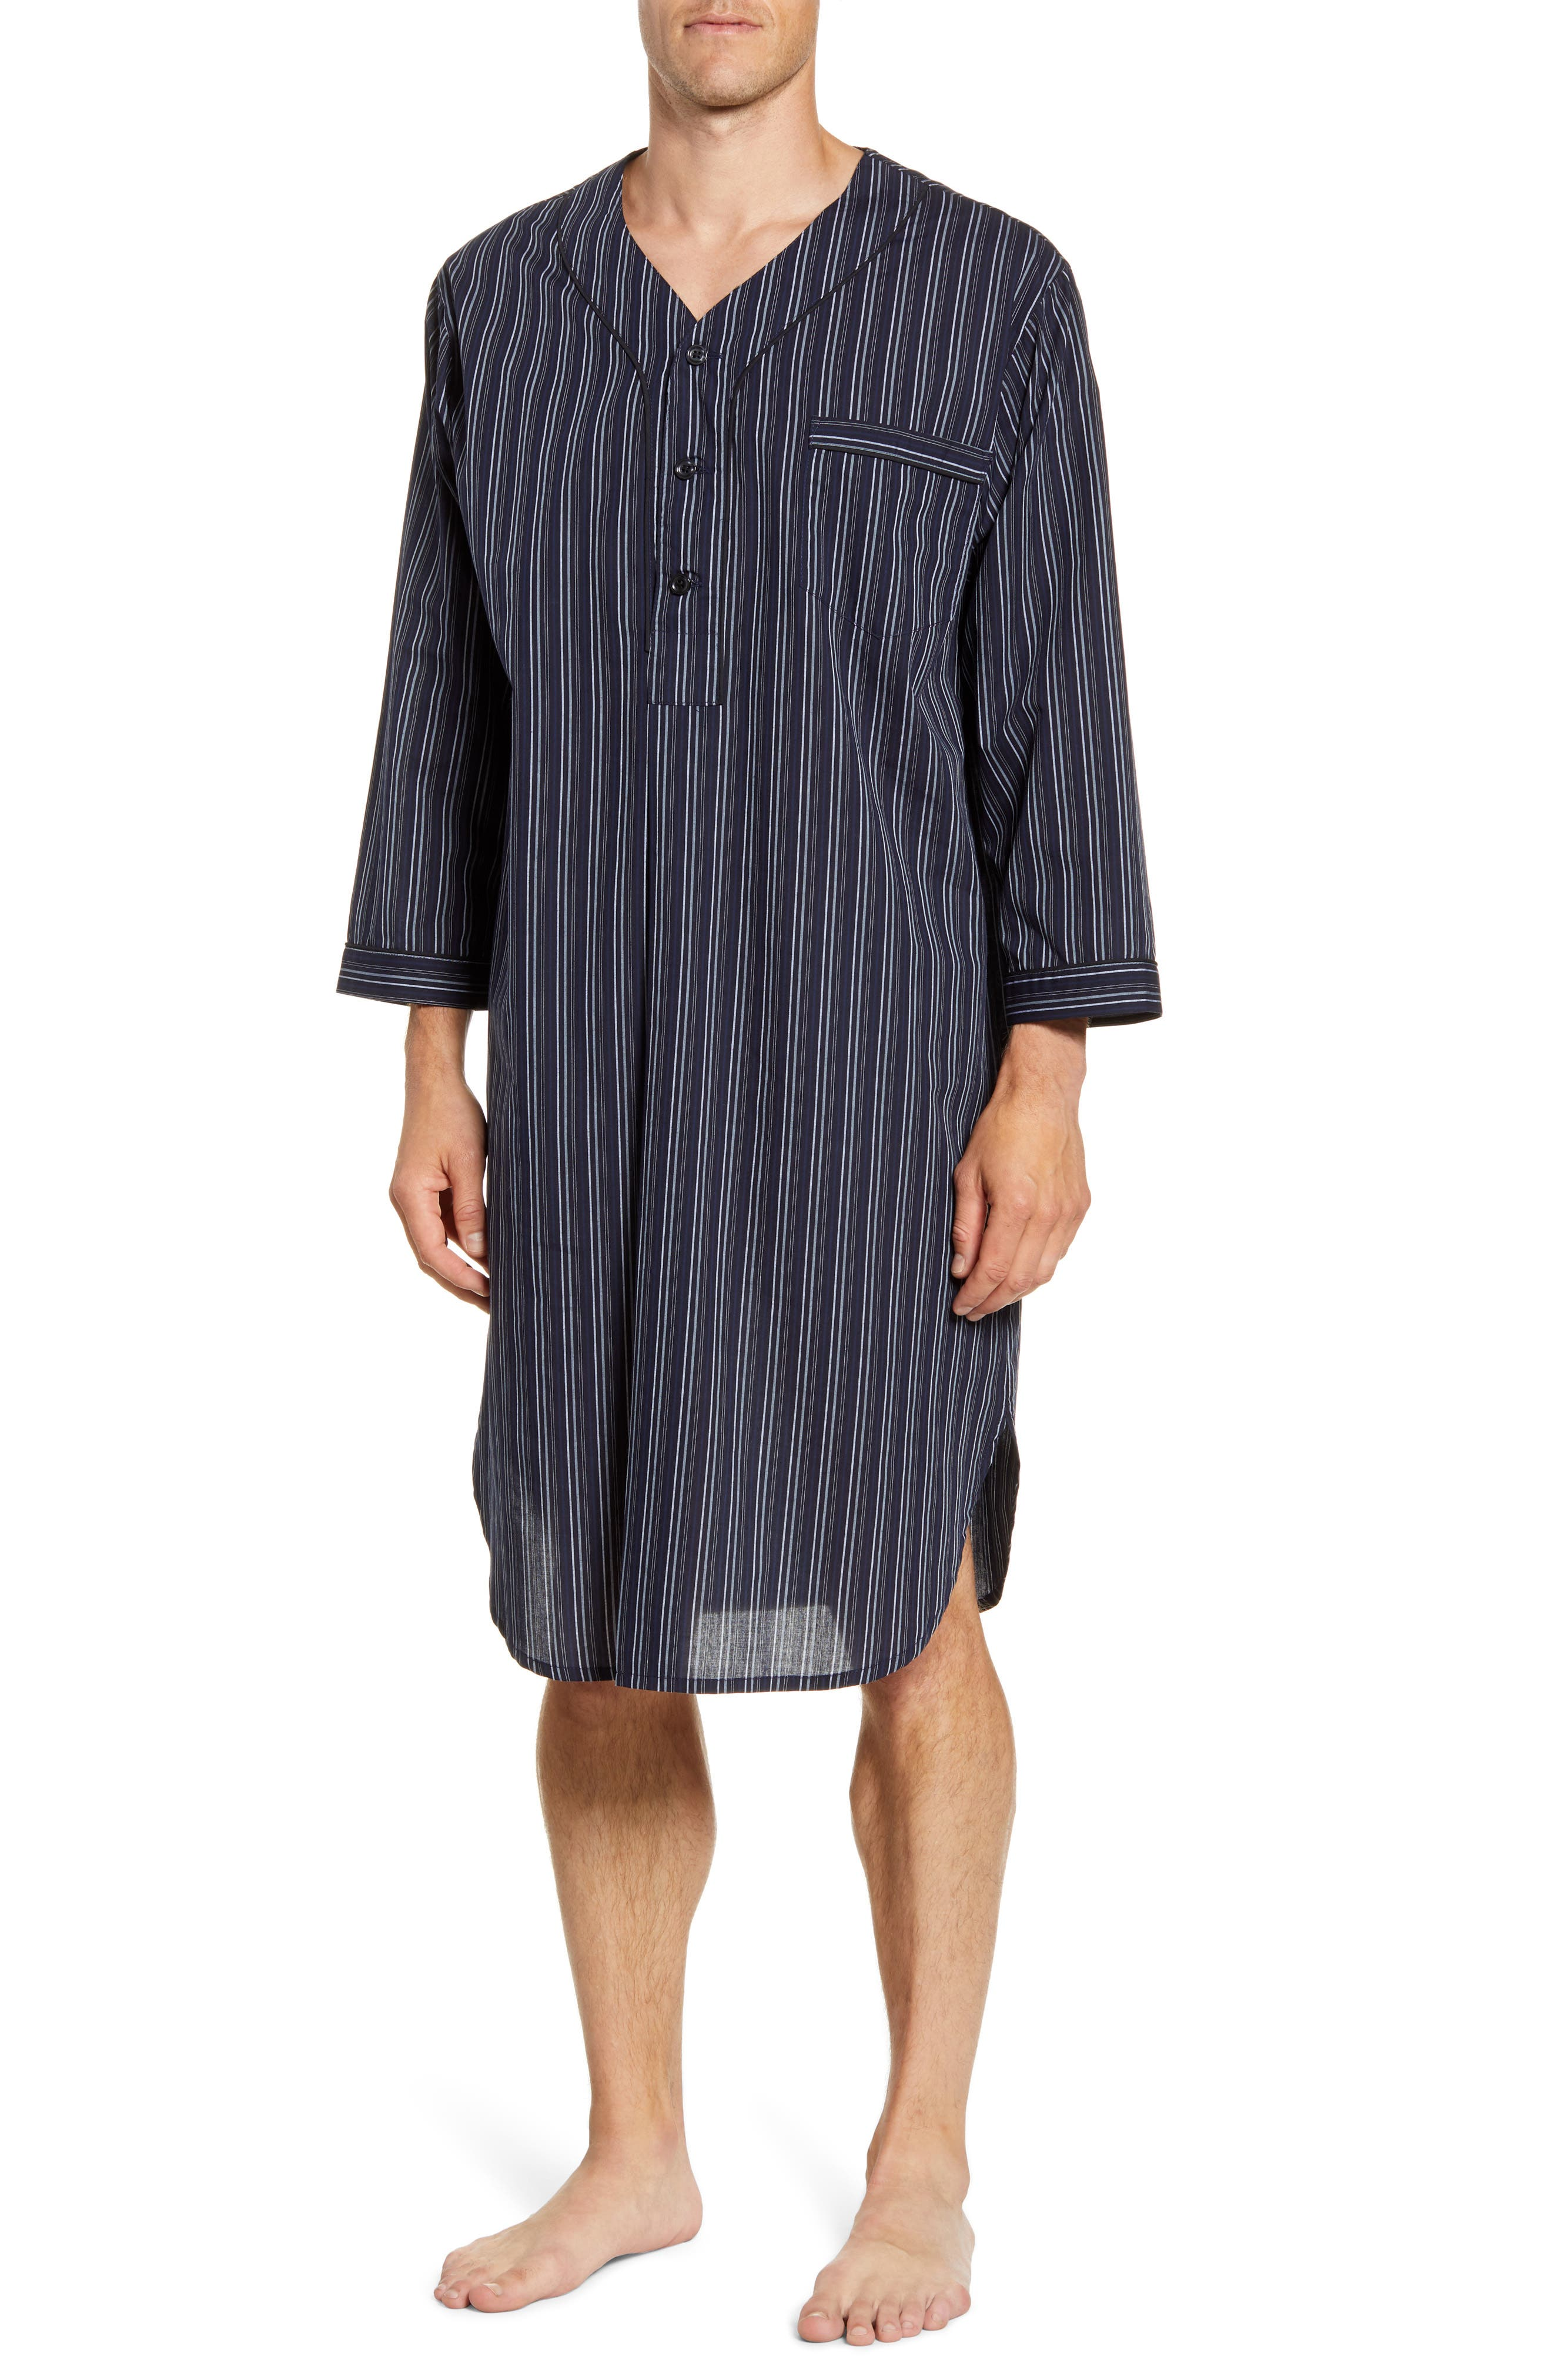 1930s Men's Fashion Guide- What Did Men Wear? Mens Big  Tall Majestic International Bar Blues Cotton Blend Nightshirt $65.00 AT vintagedancer.com